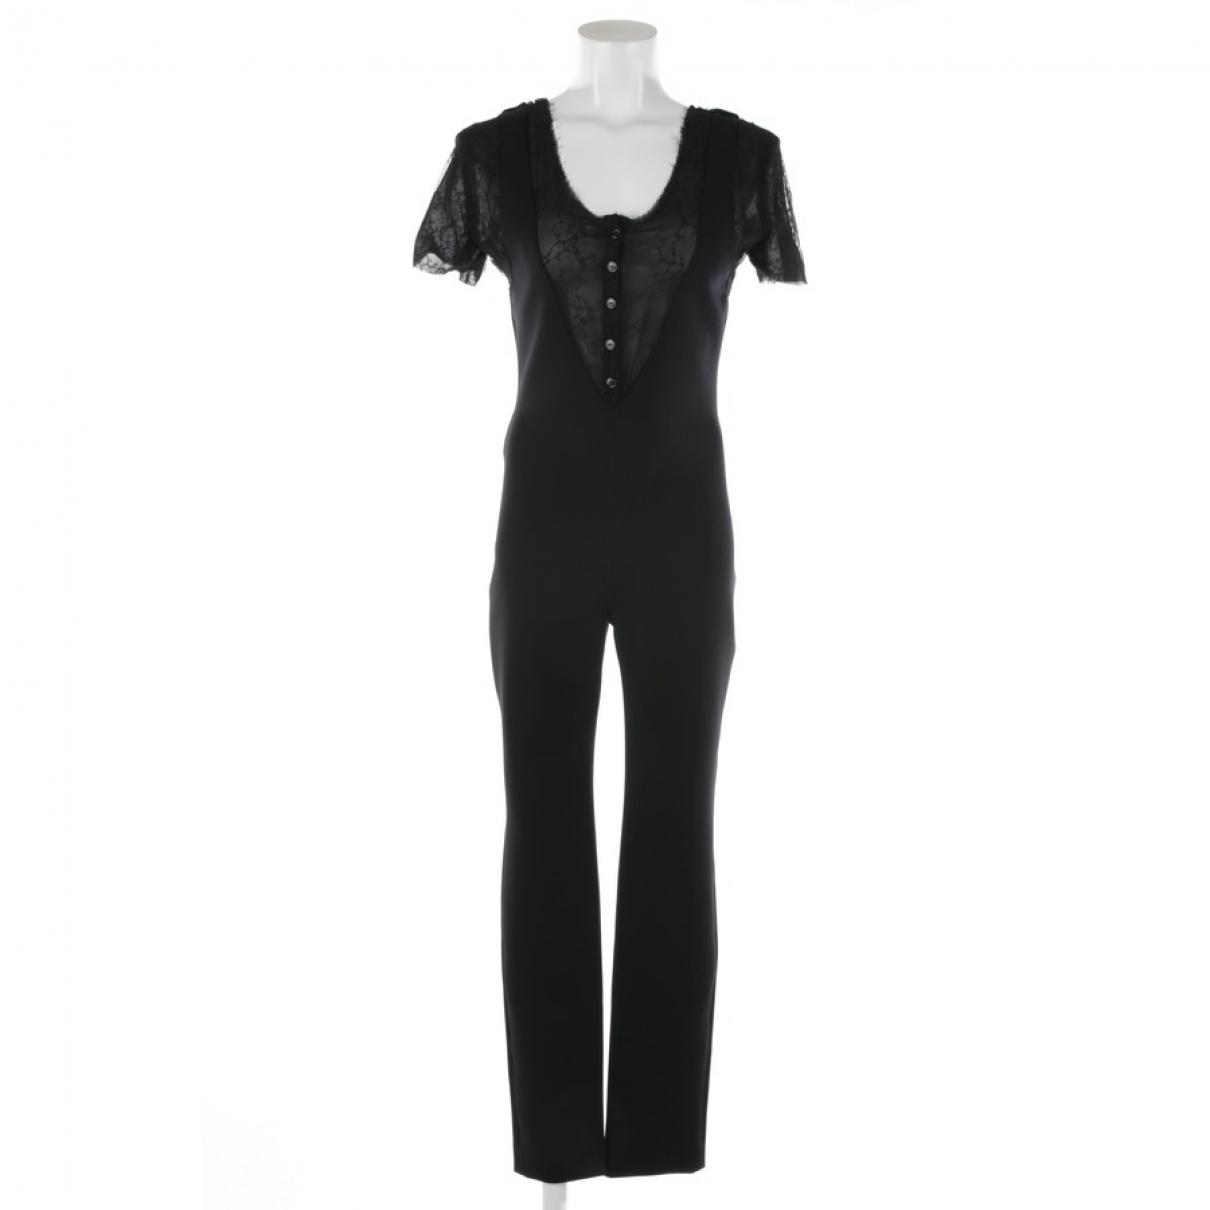 Chanel \N Black jumpsuit for Women 36 FR